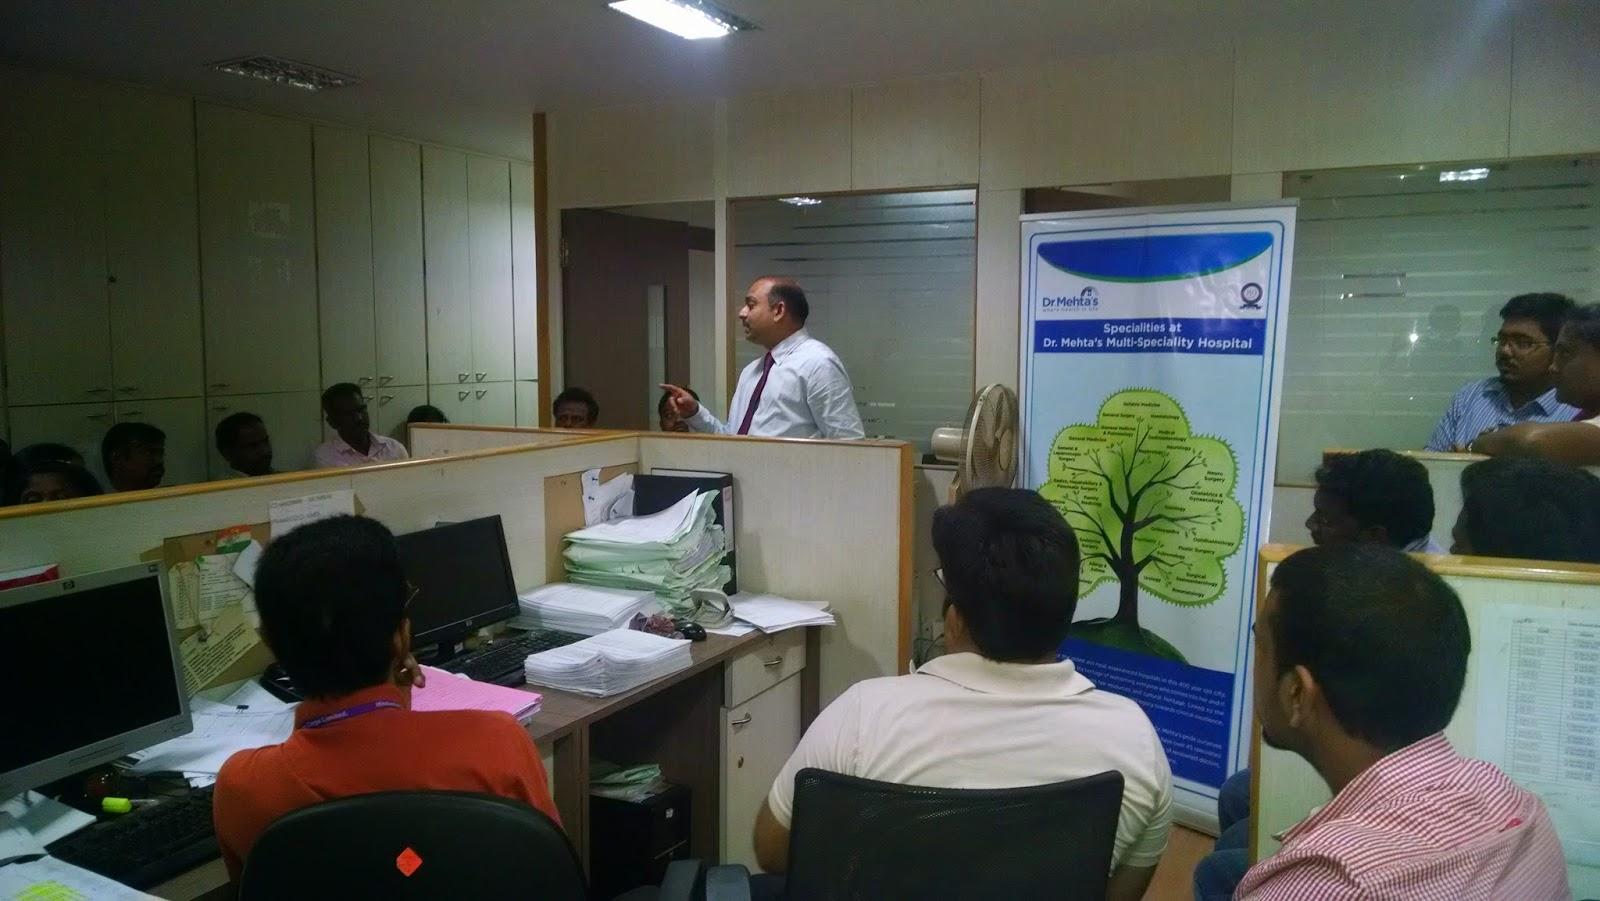 IMG_20140823_113834486-Dr.Mehta's Hospitals